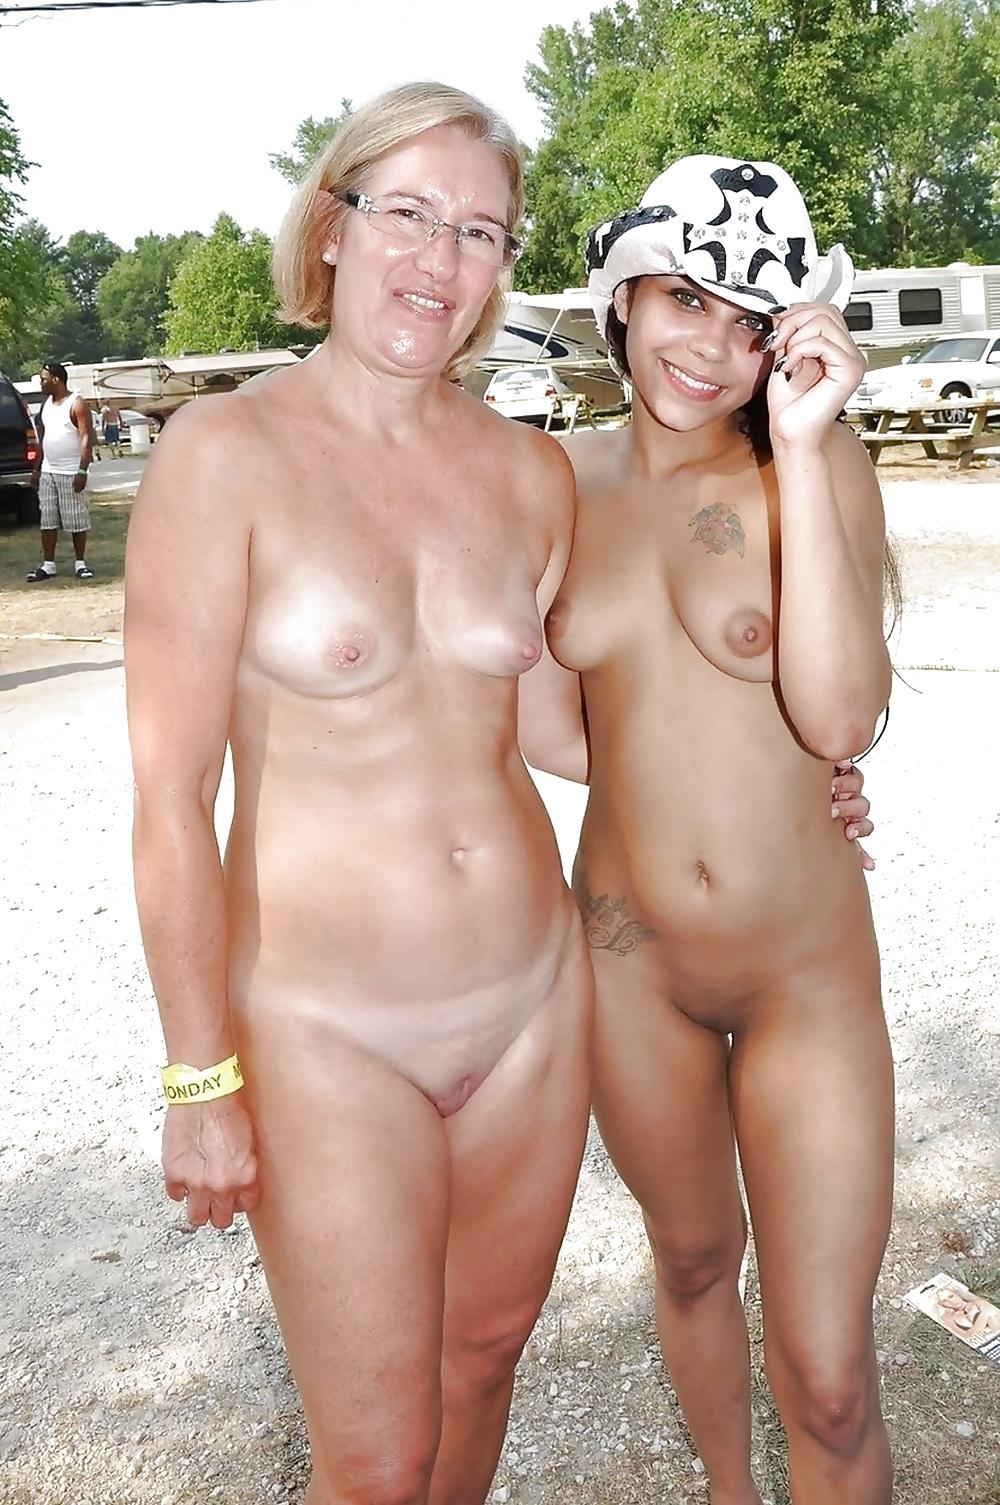 Tumblr oops nude Girls Swimming